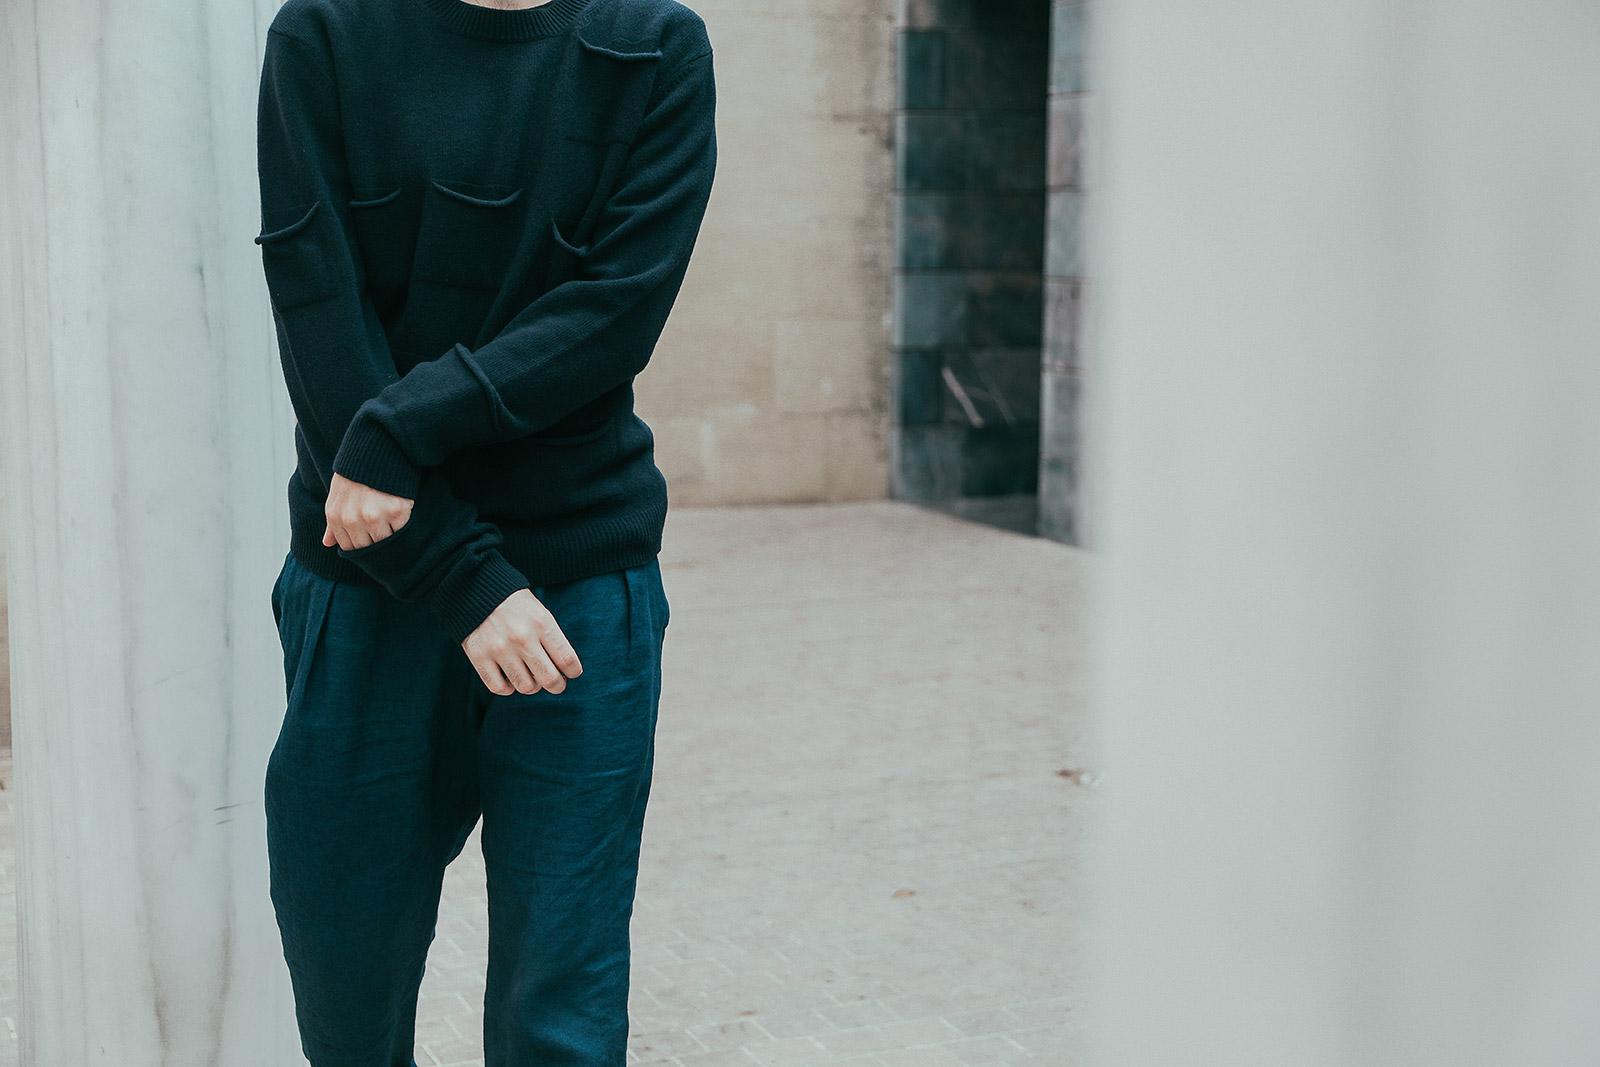 cupofcouple-jwanderson-acne_studios-mens-matches_fashion-0010